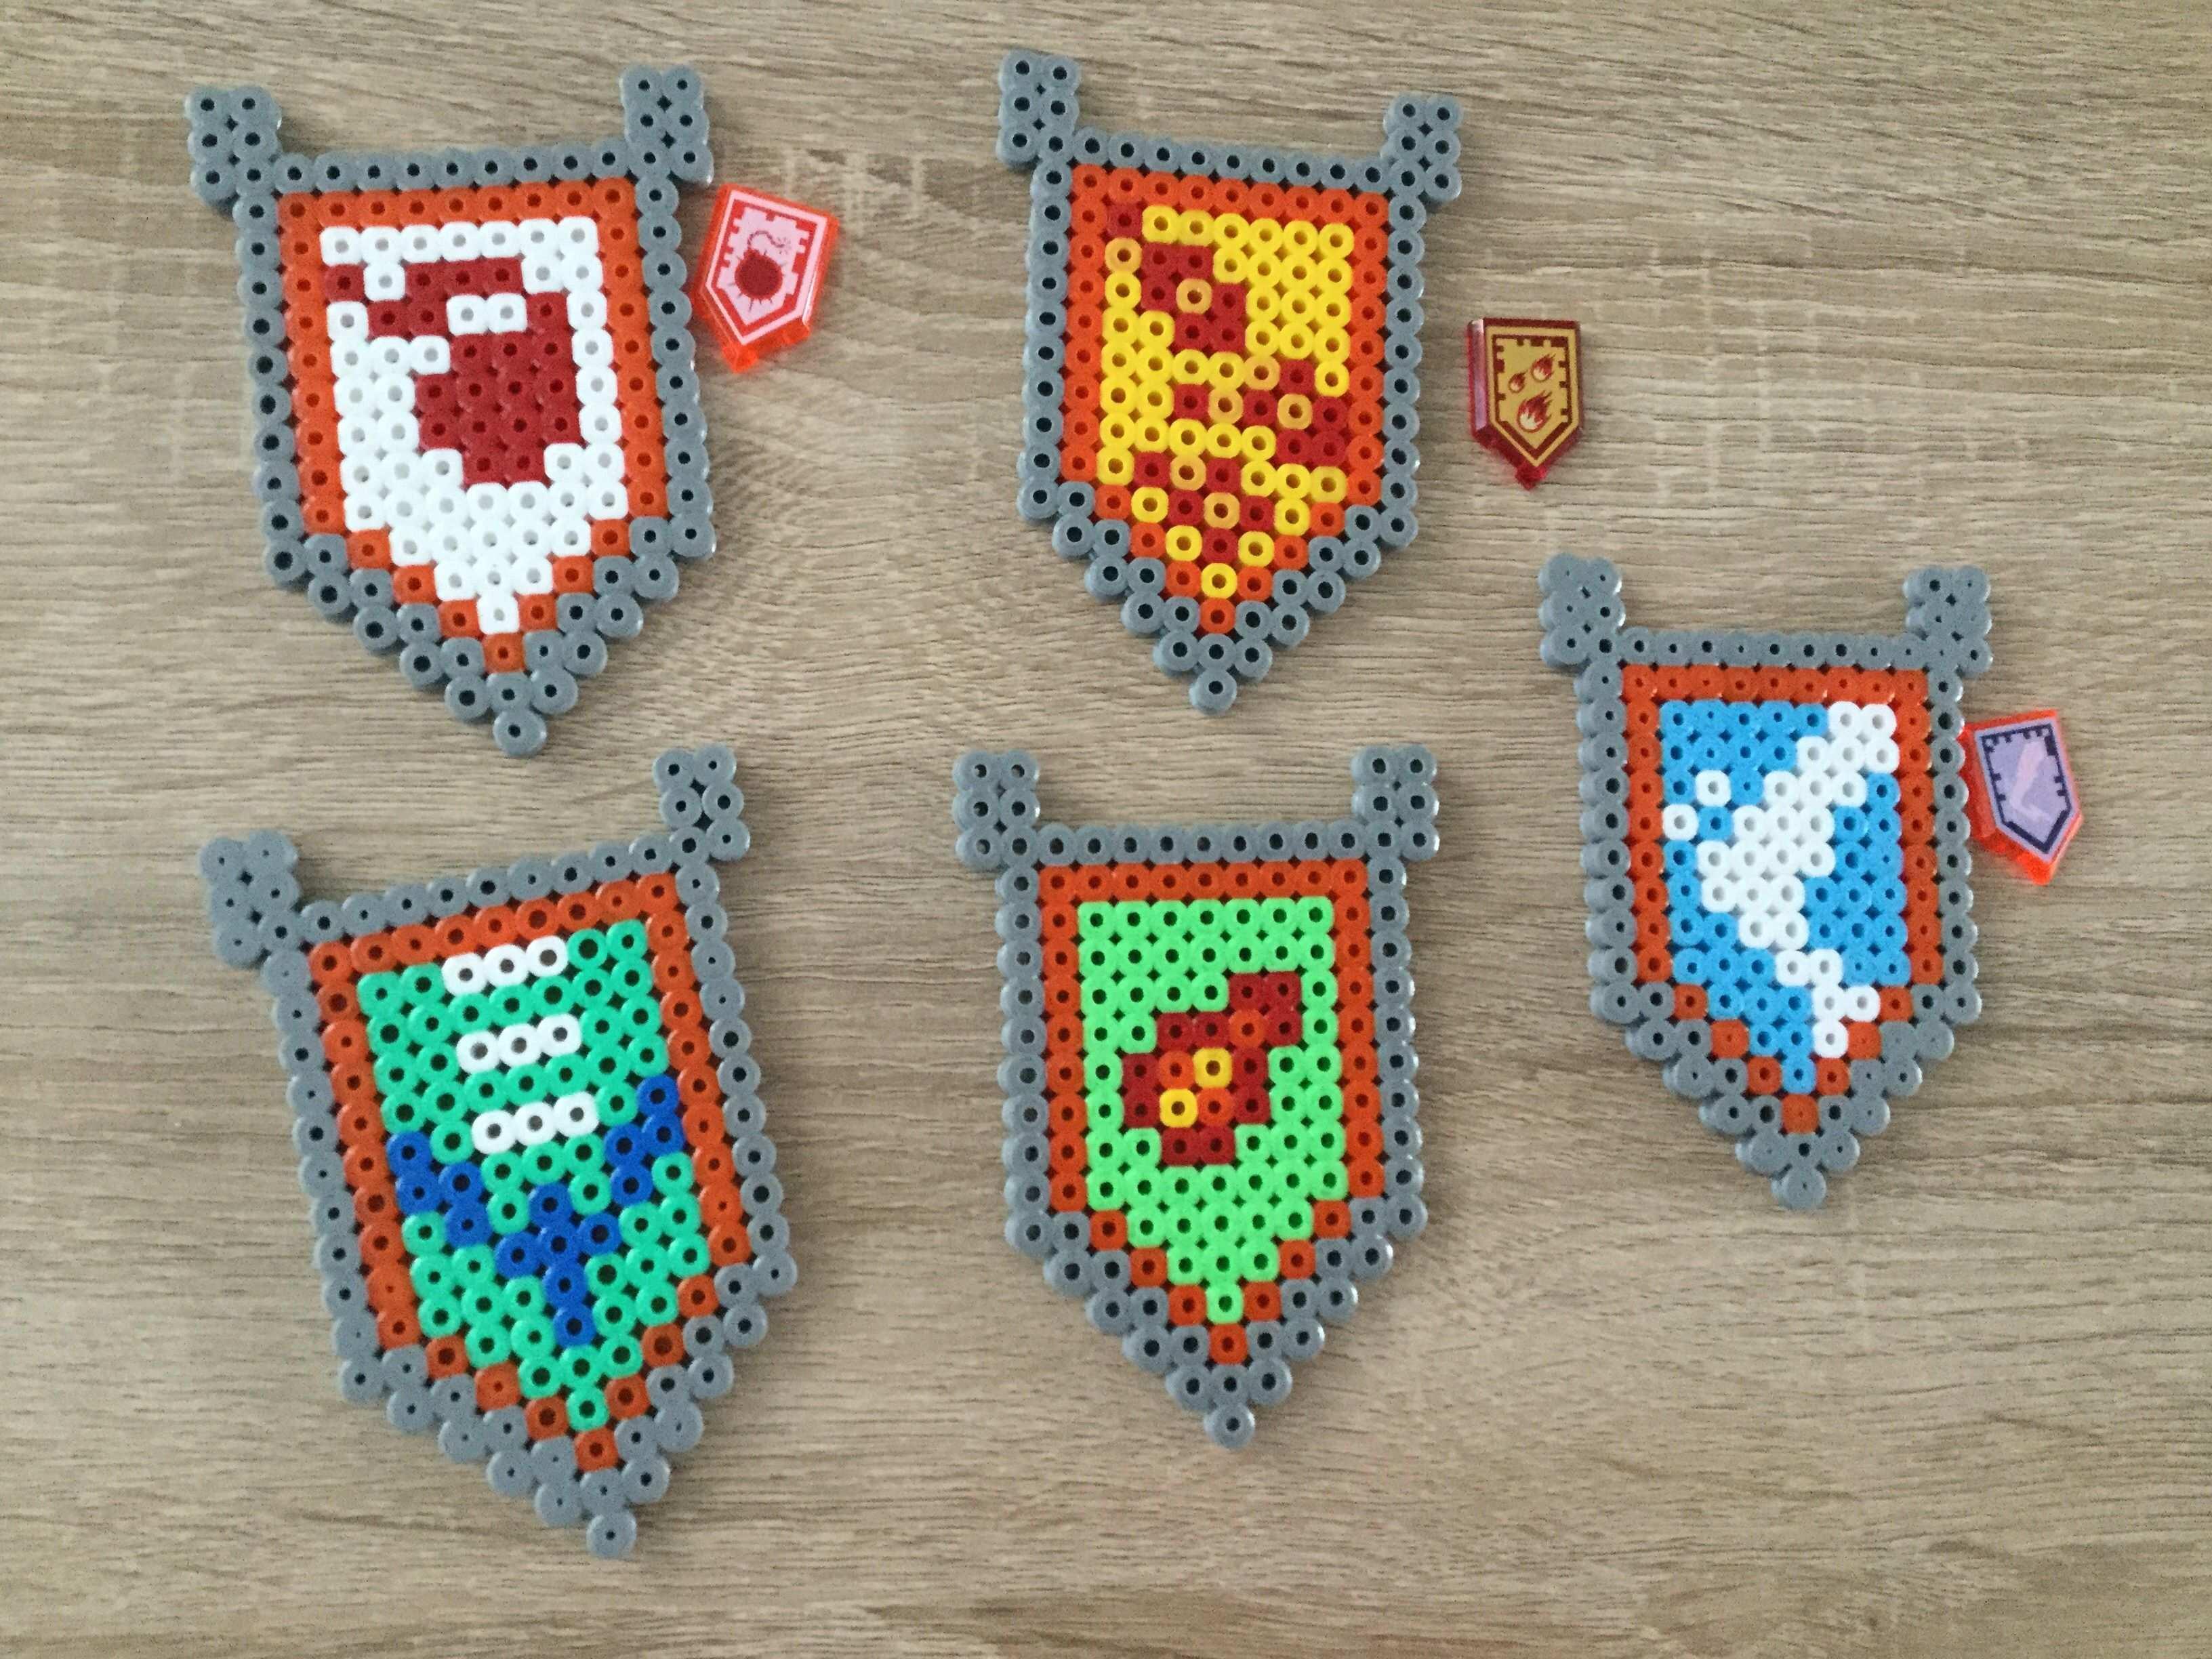 Strijkkralen Lego Nexo Knights Lego Geburtstagsparty Kindergeburtstag Bastelideen